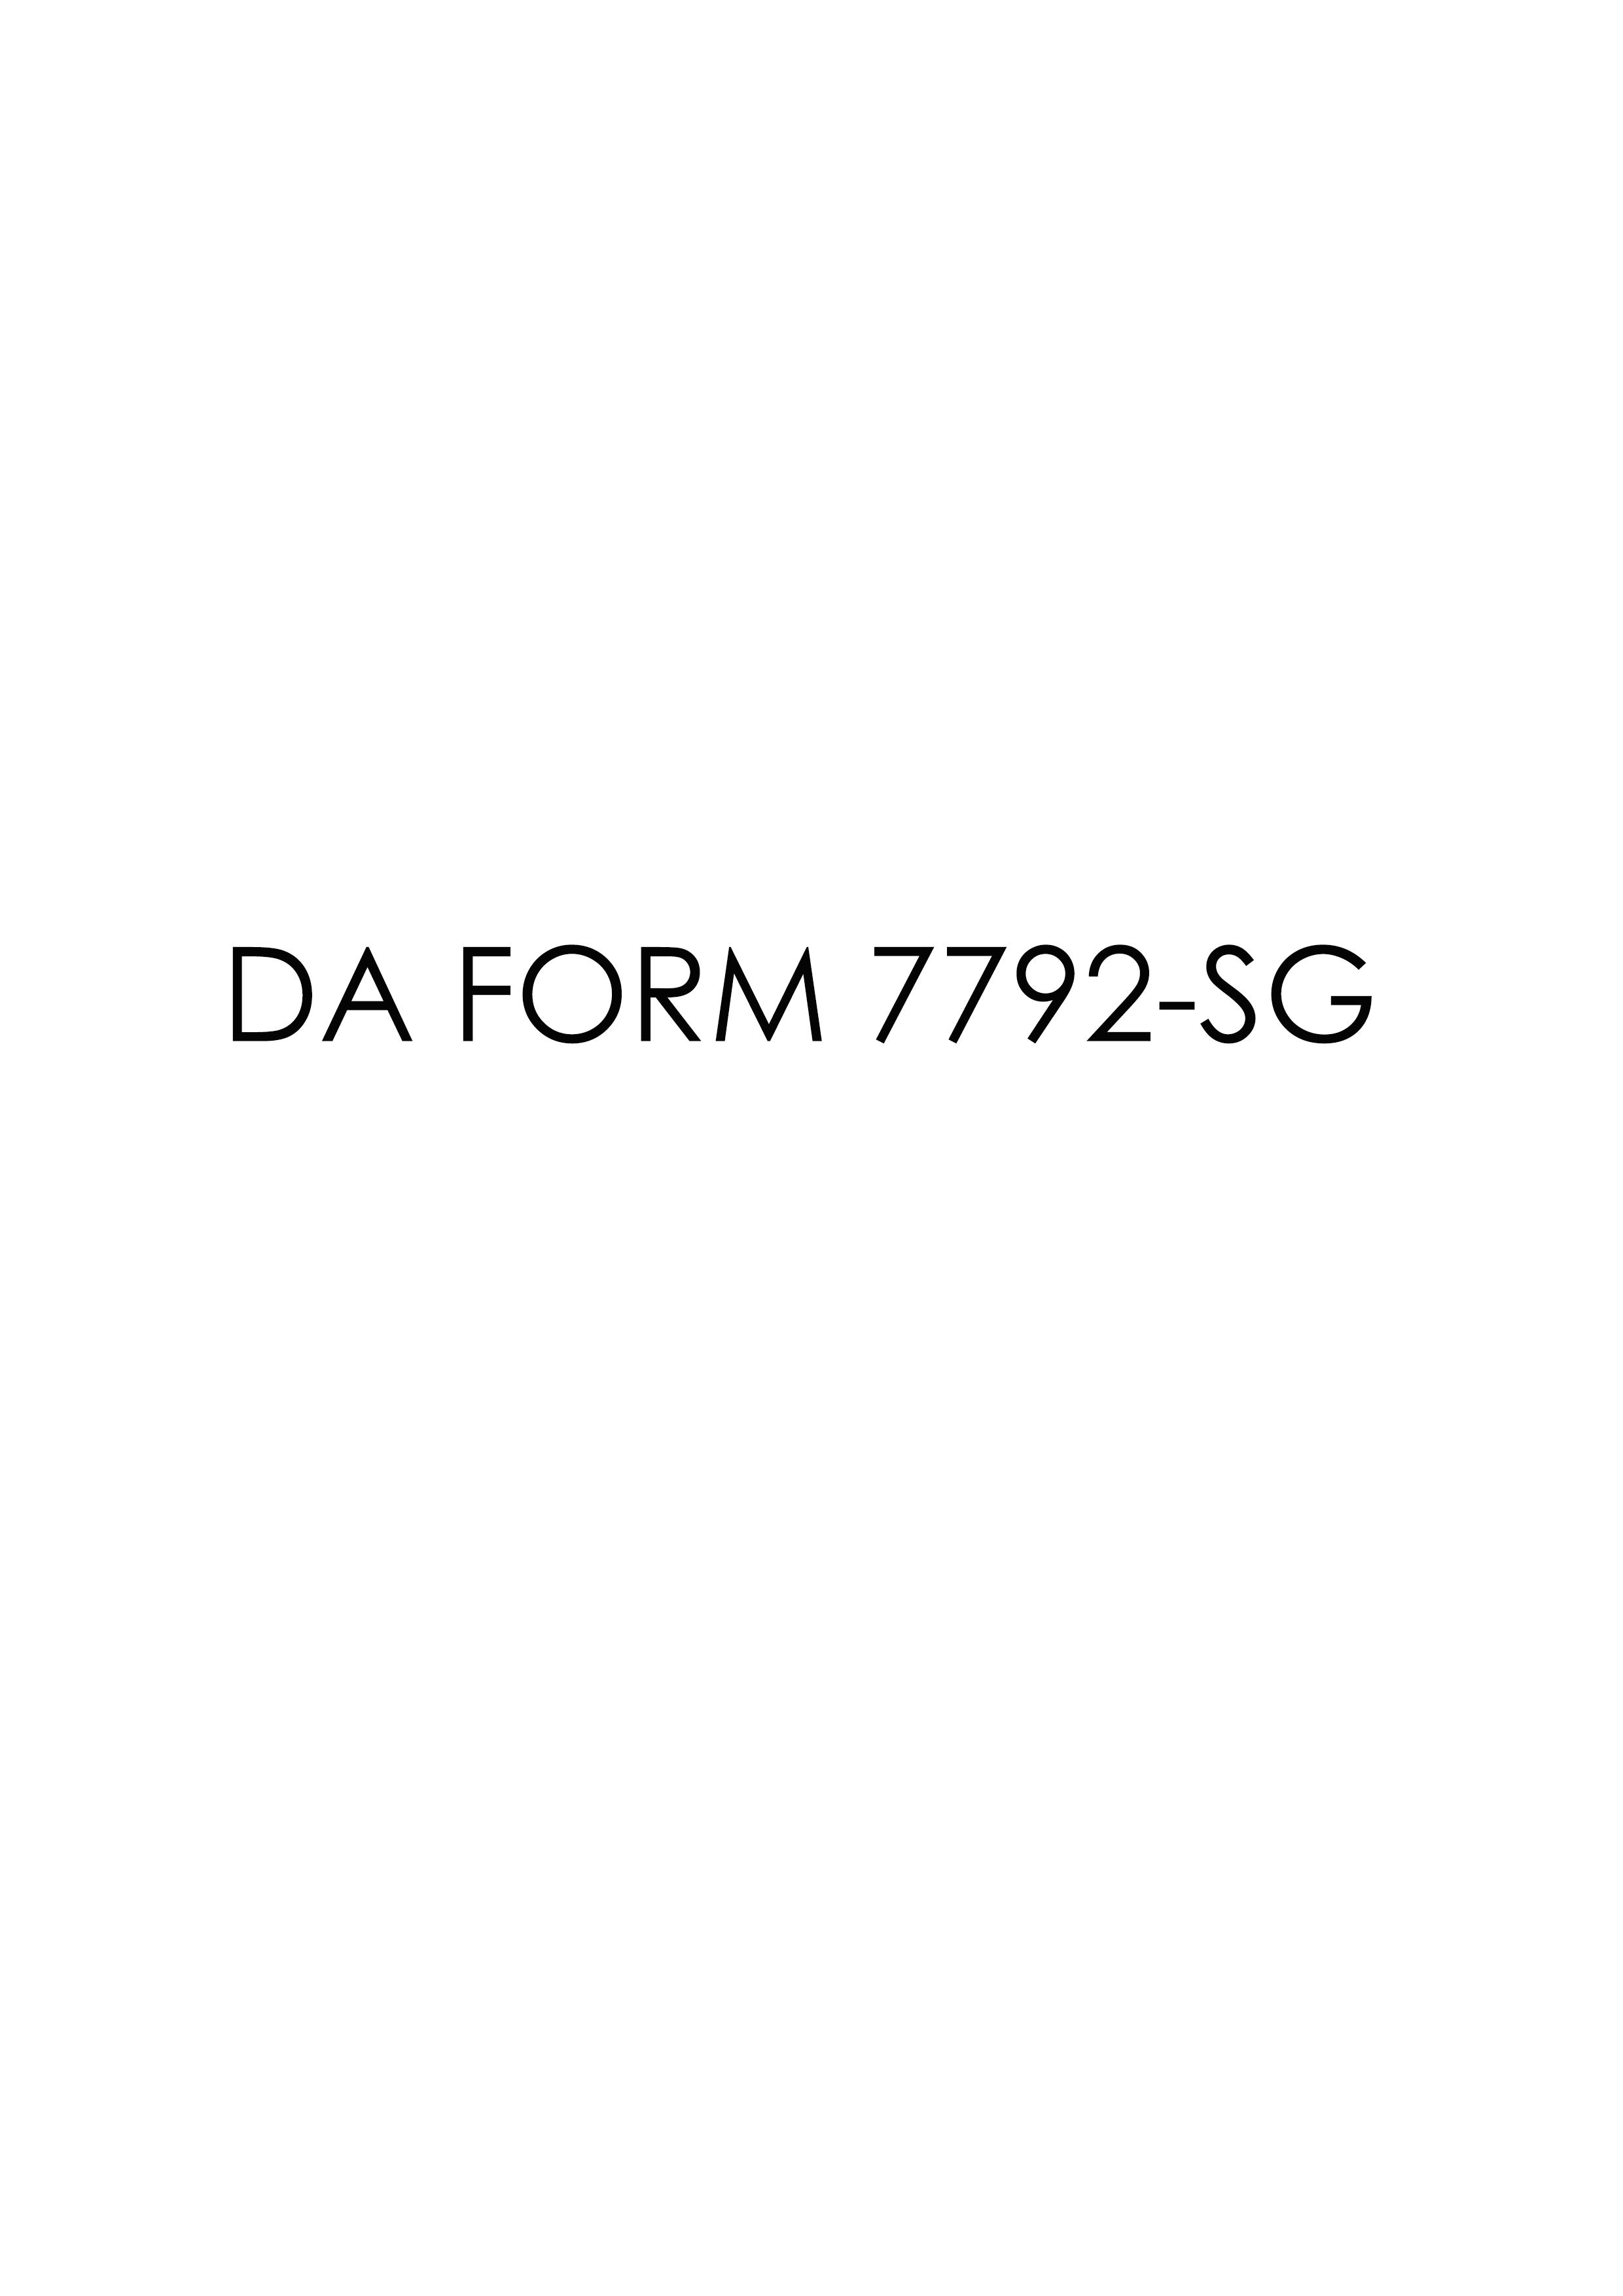 Download da Form 7792-SG Free